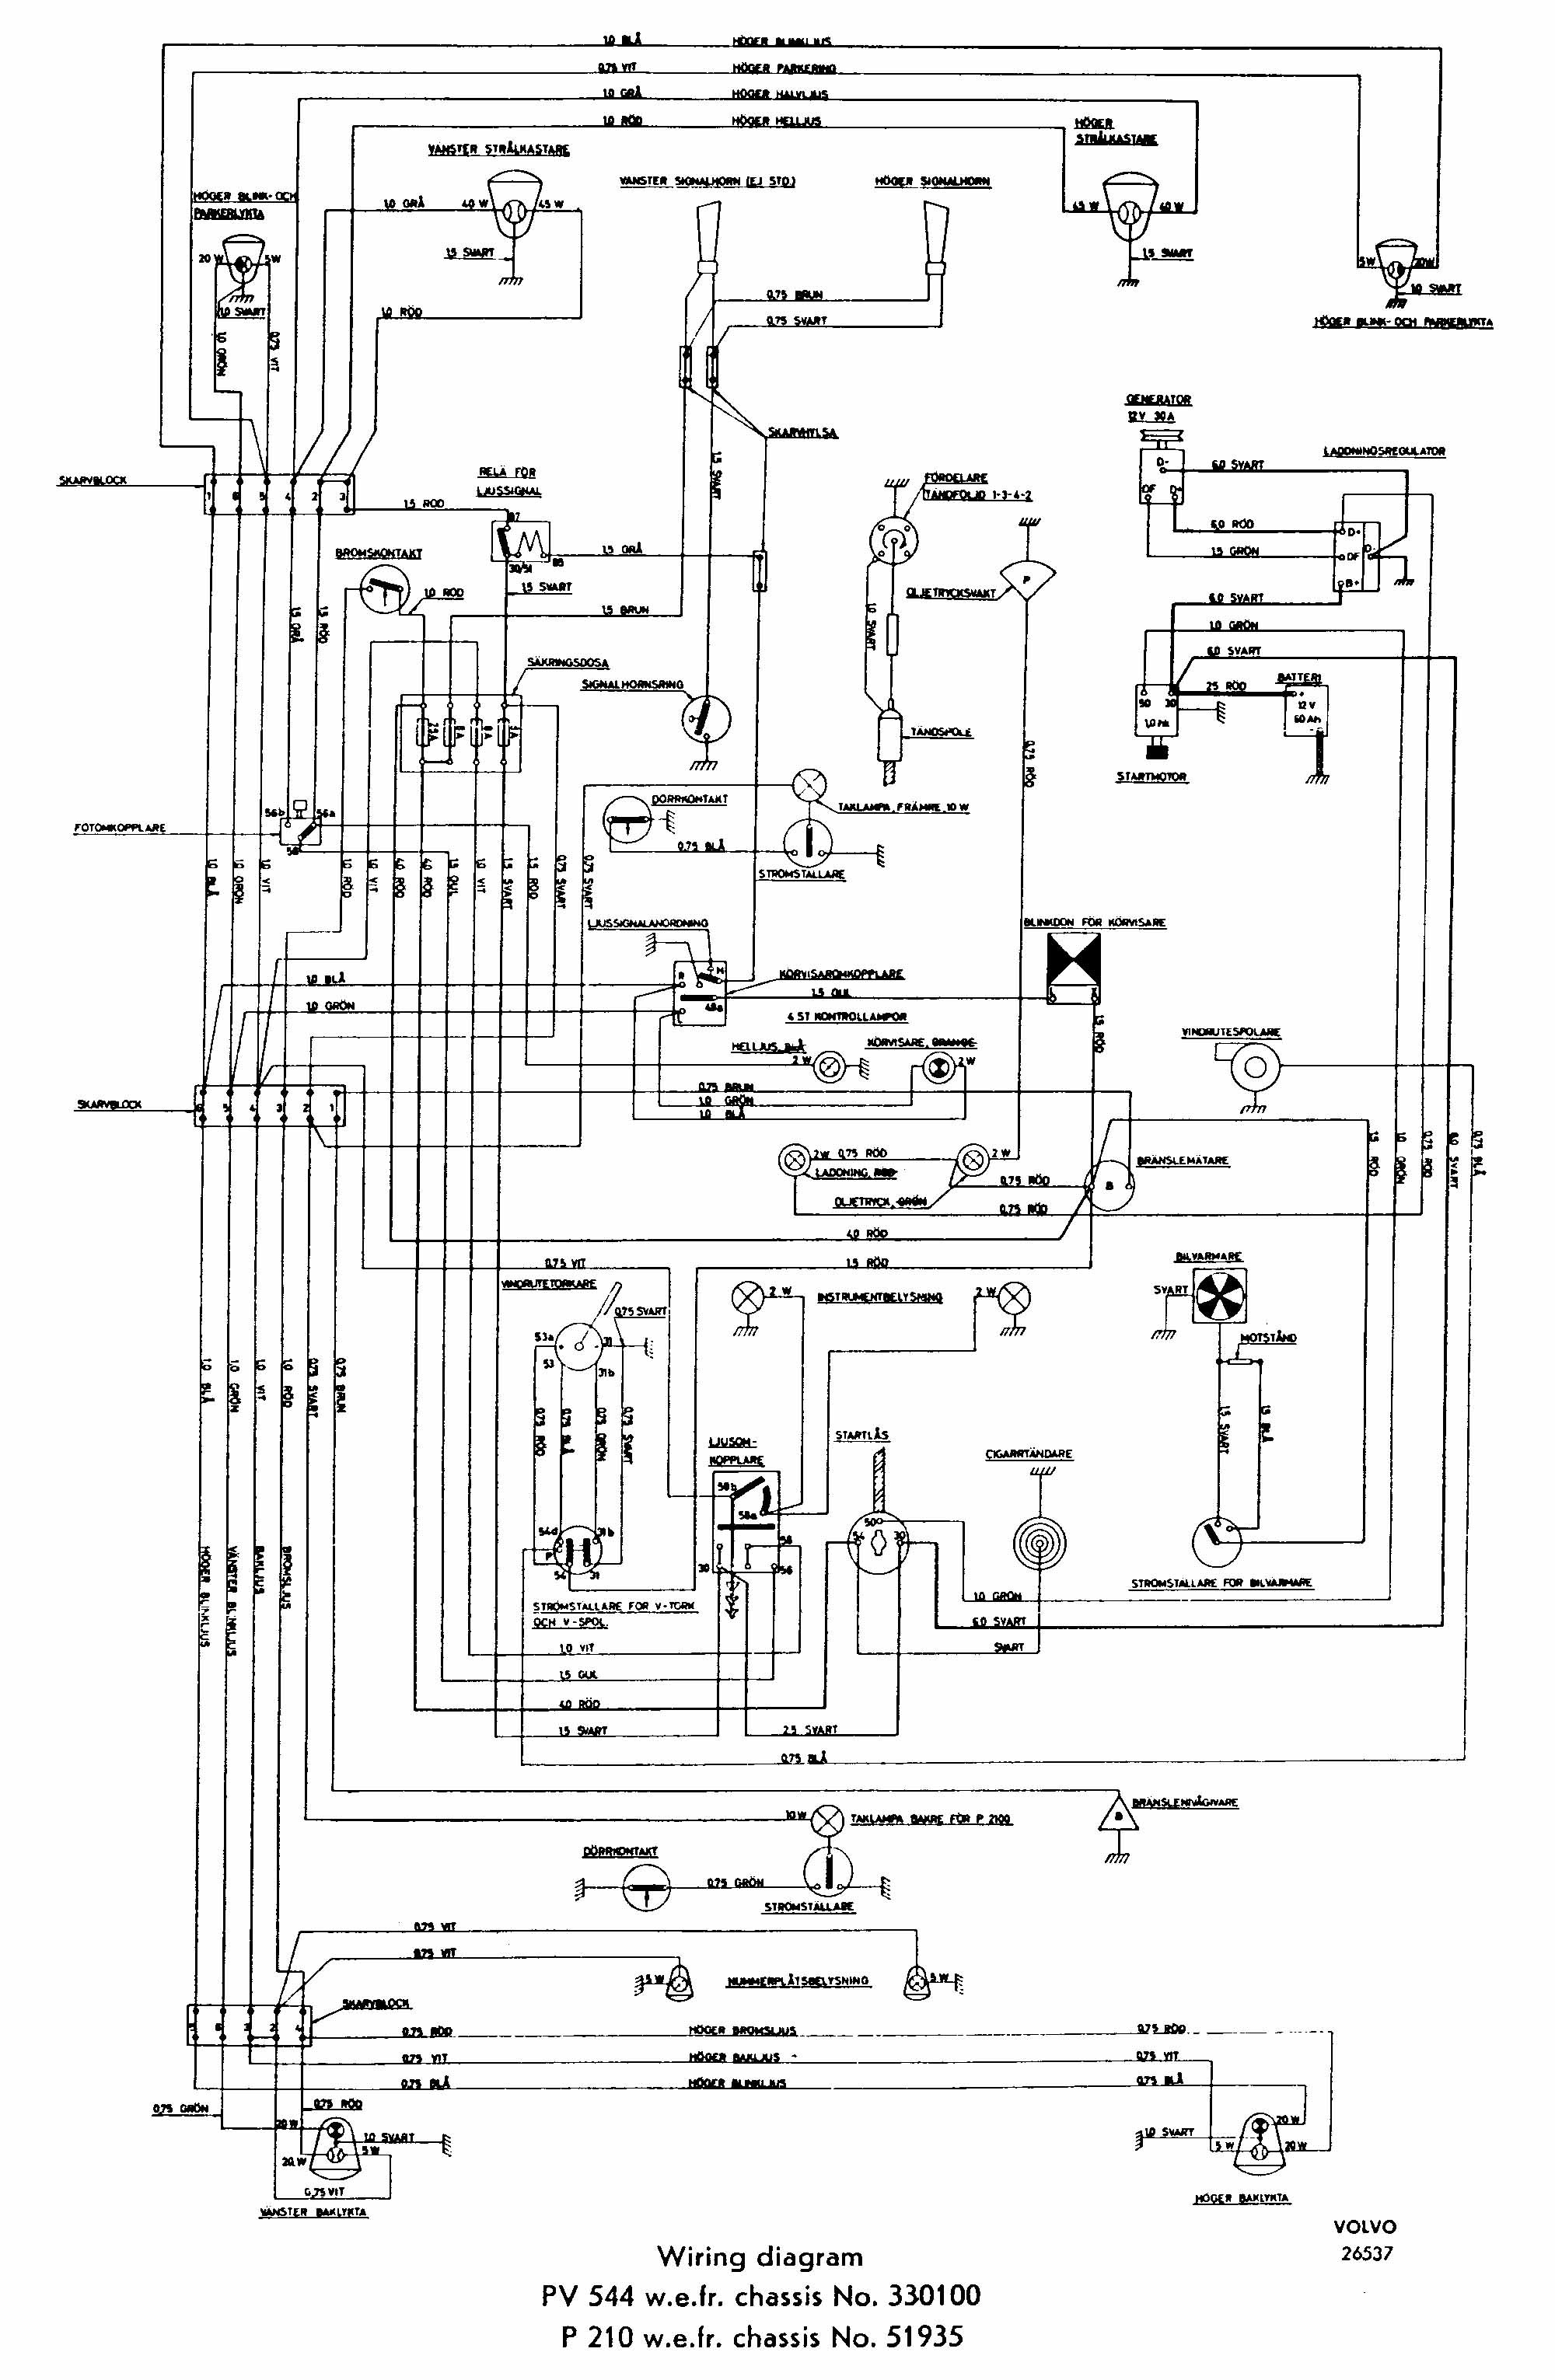 Volvo V40 Engine Diagram Sw Em Service Notes Of Volvo V40 Engine Diagram